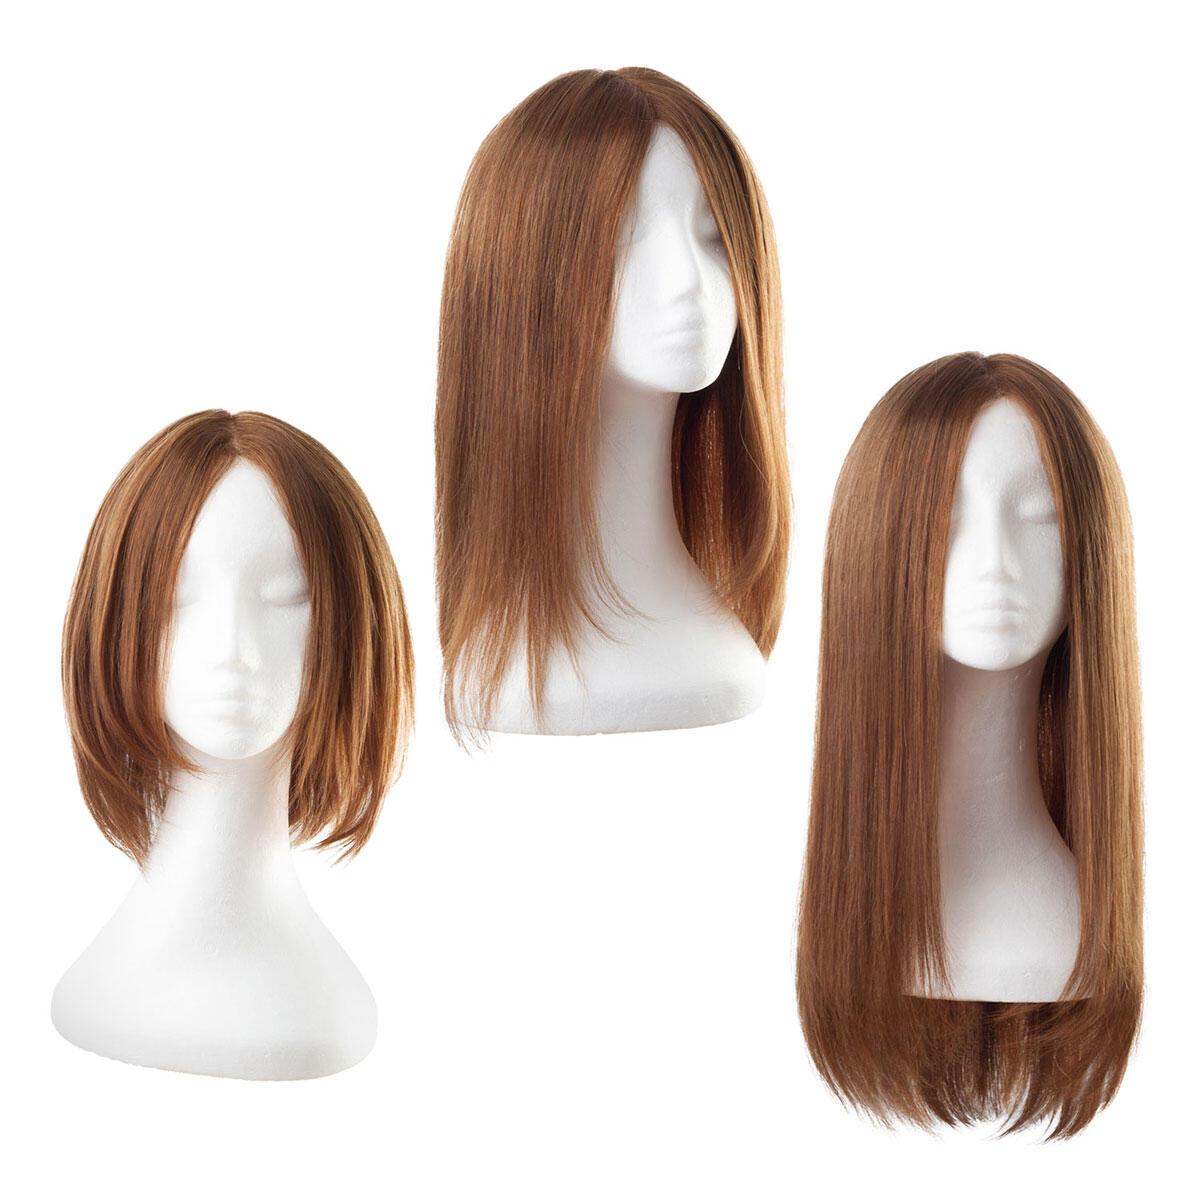 Lace Wig Human Hair 5.0 Brown 30 cm